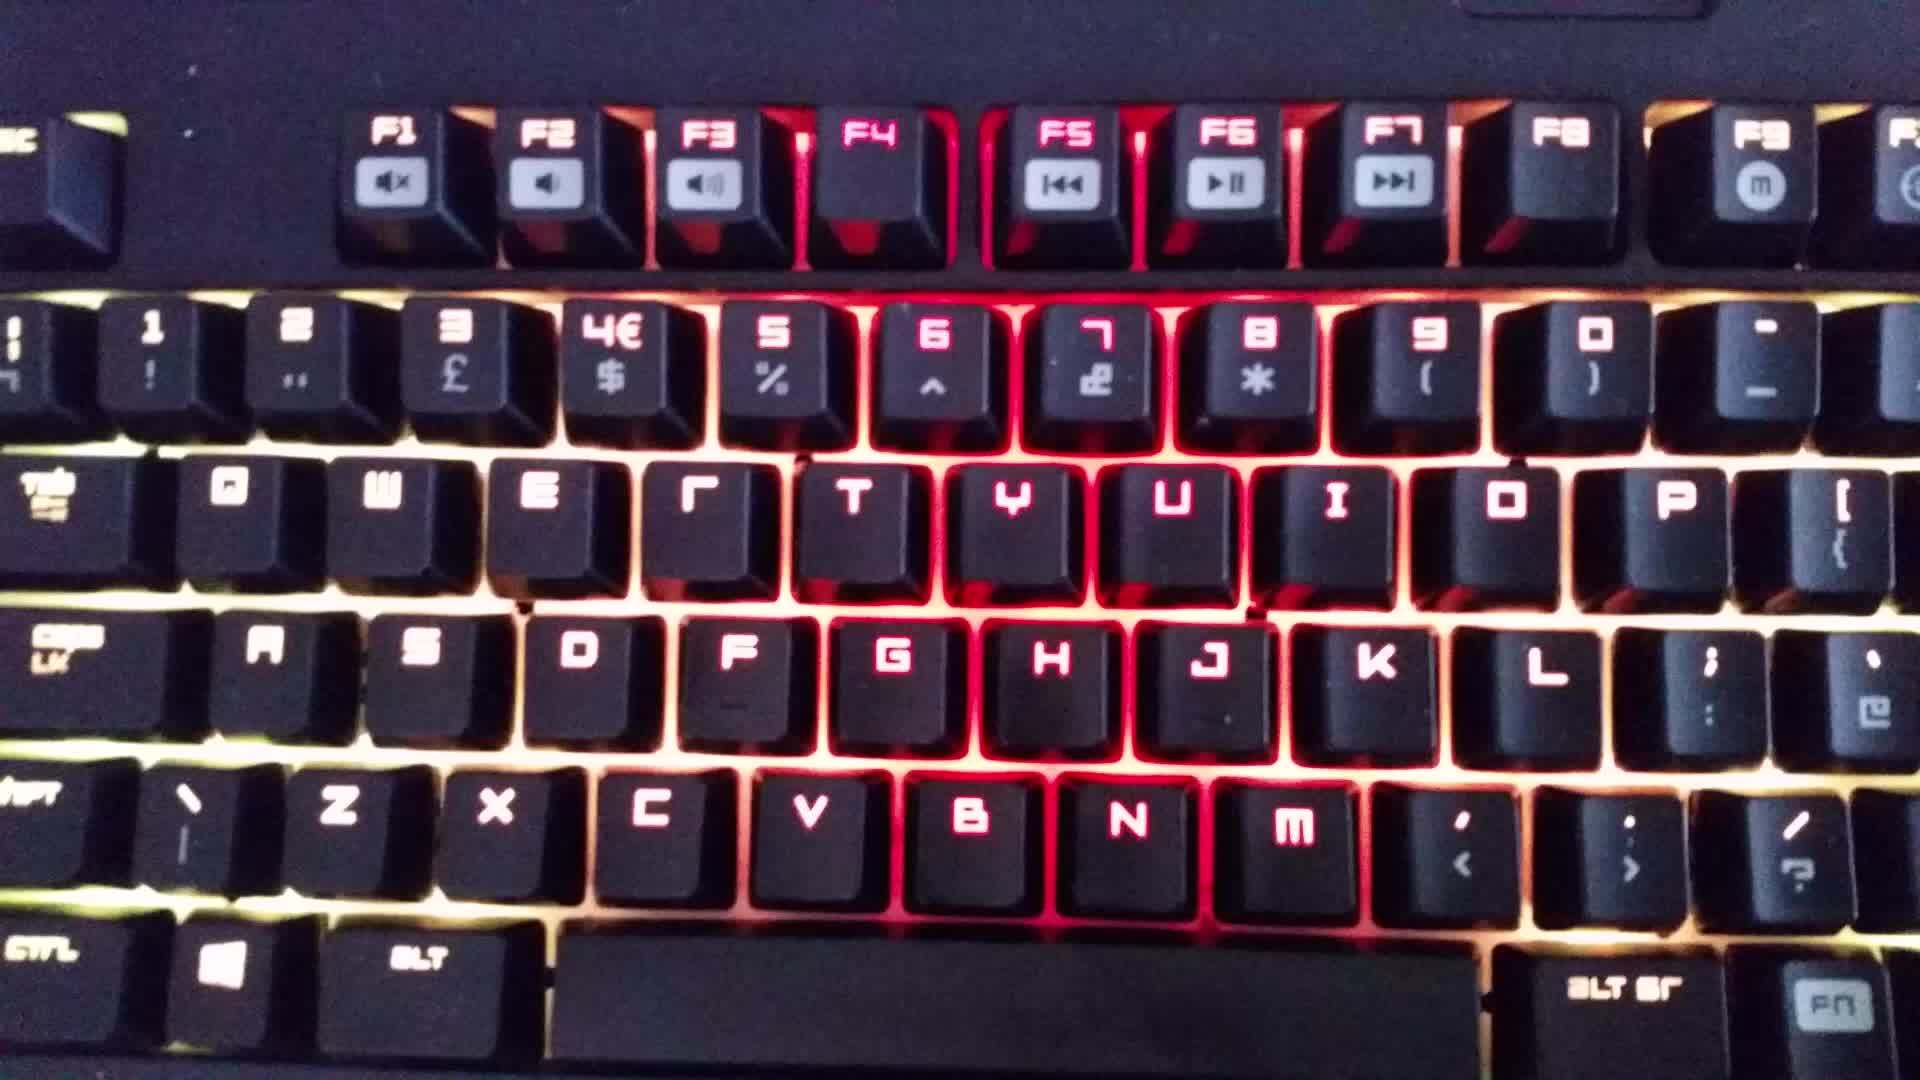 mechanicalkeyboards, Loving my new keyboard! [Razer Blackwidow Chroma] (reddit) GIFs